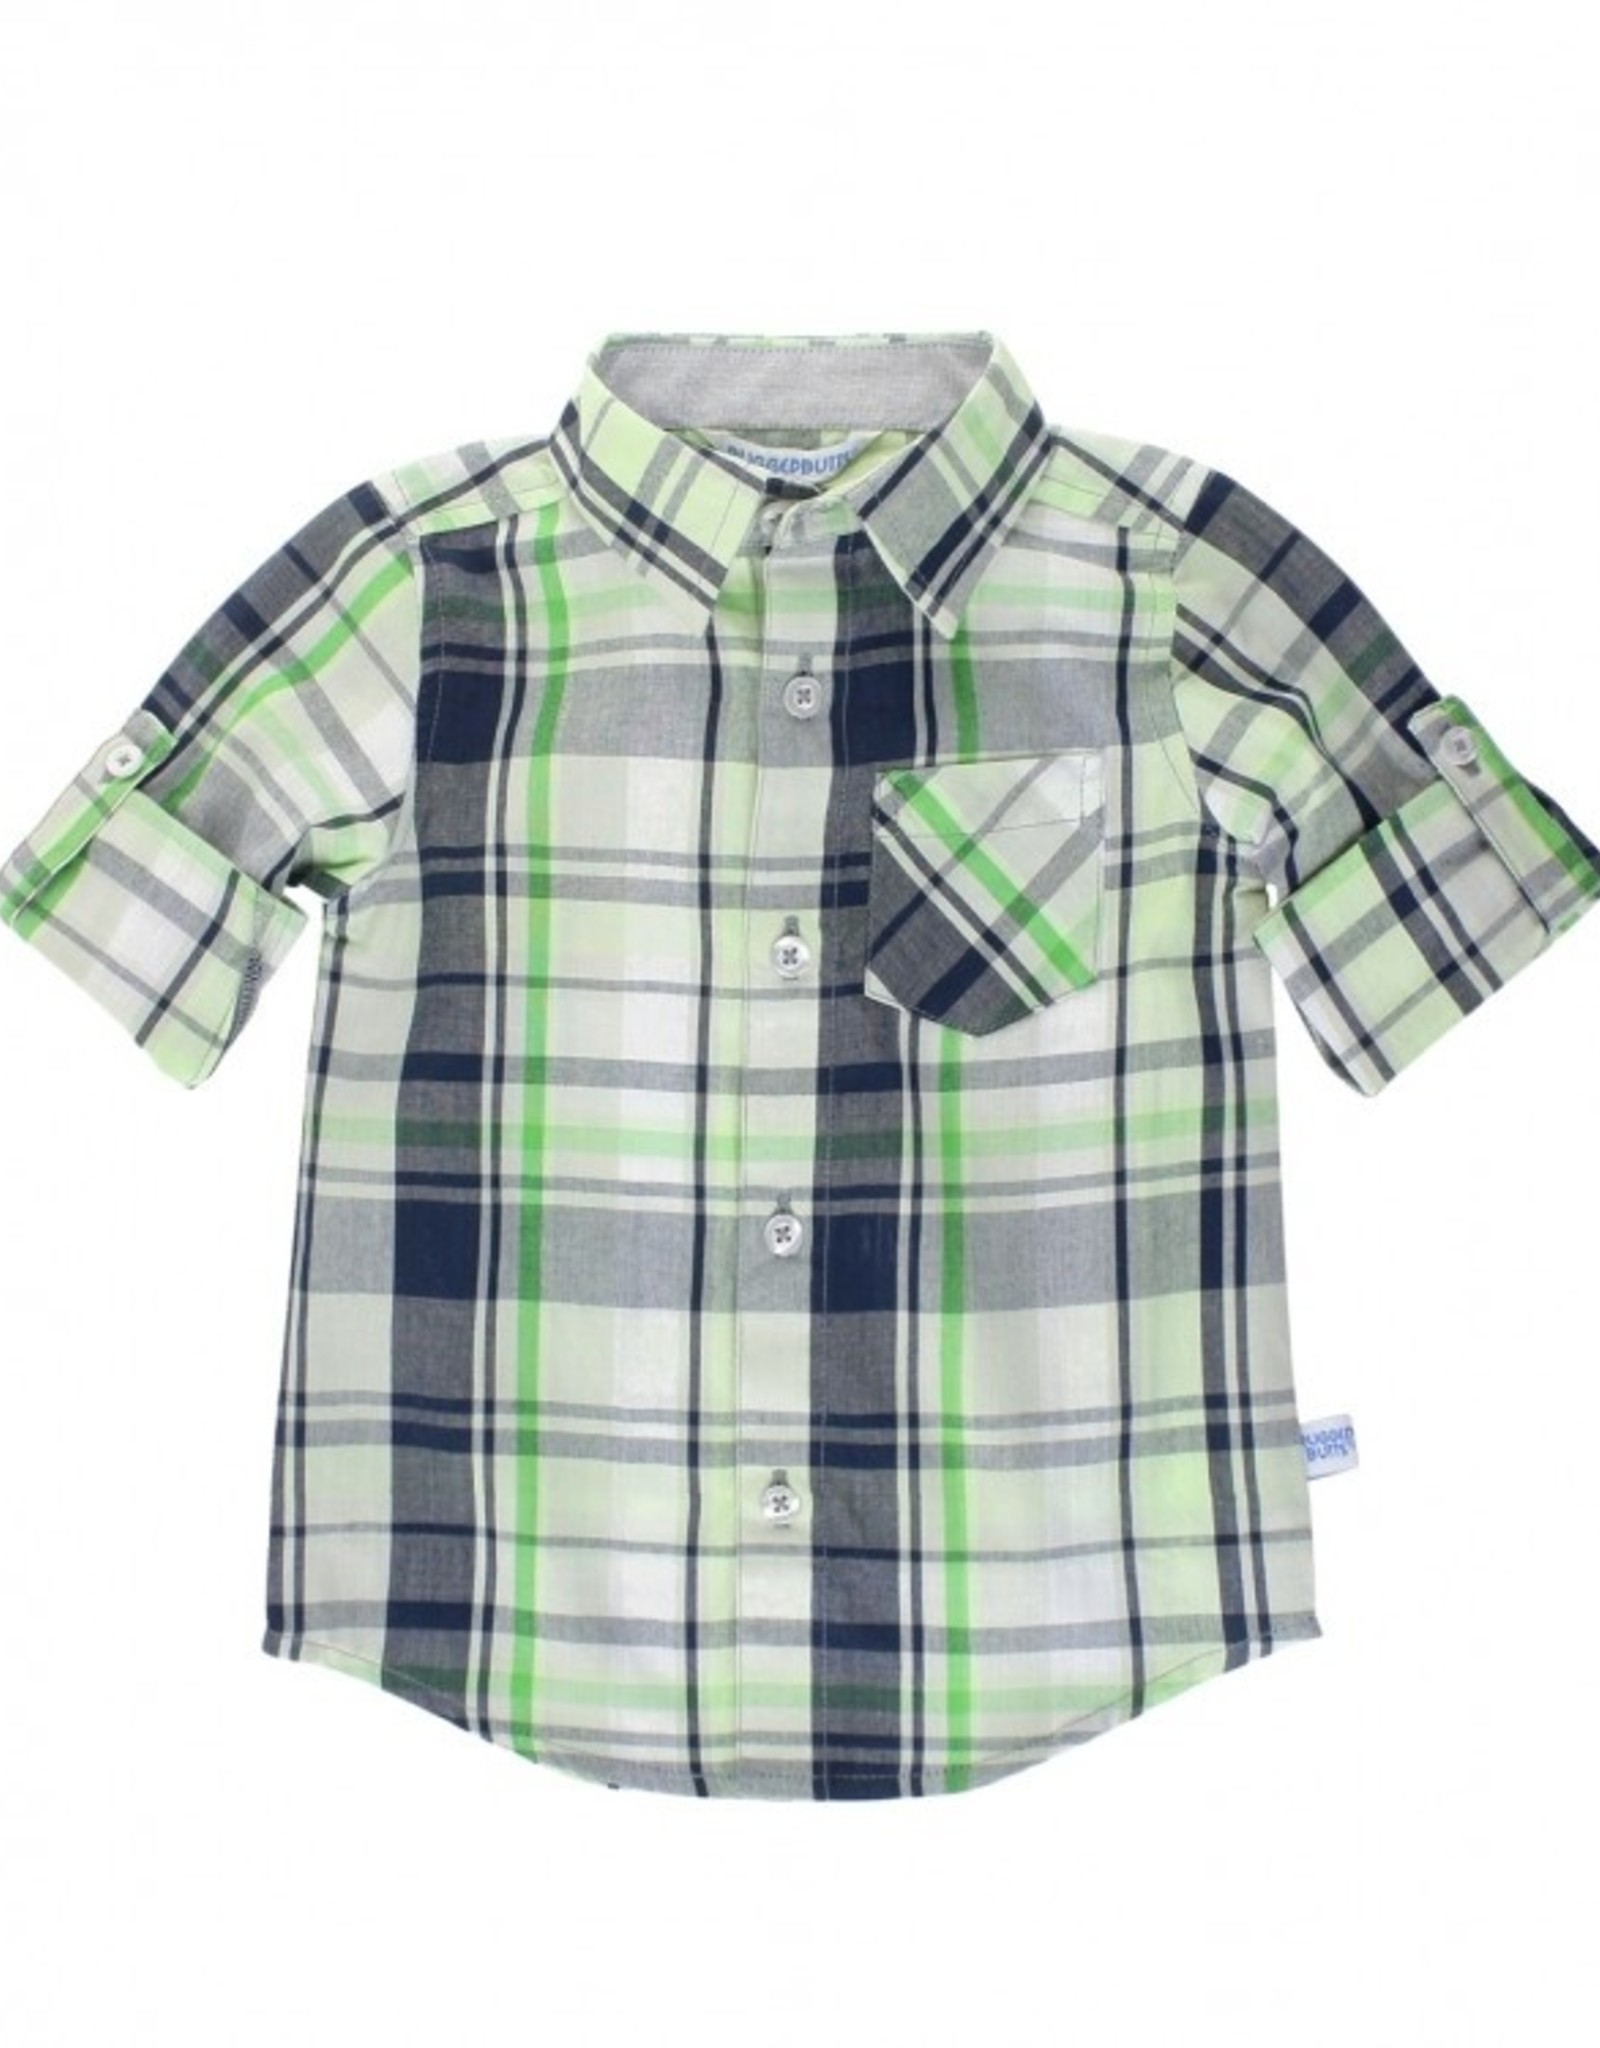 RuggedButts Reid Plaid Button Down Shirt 2T